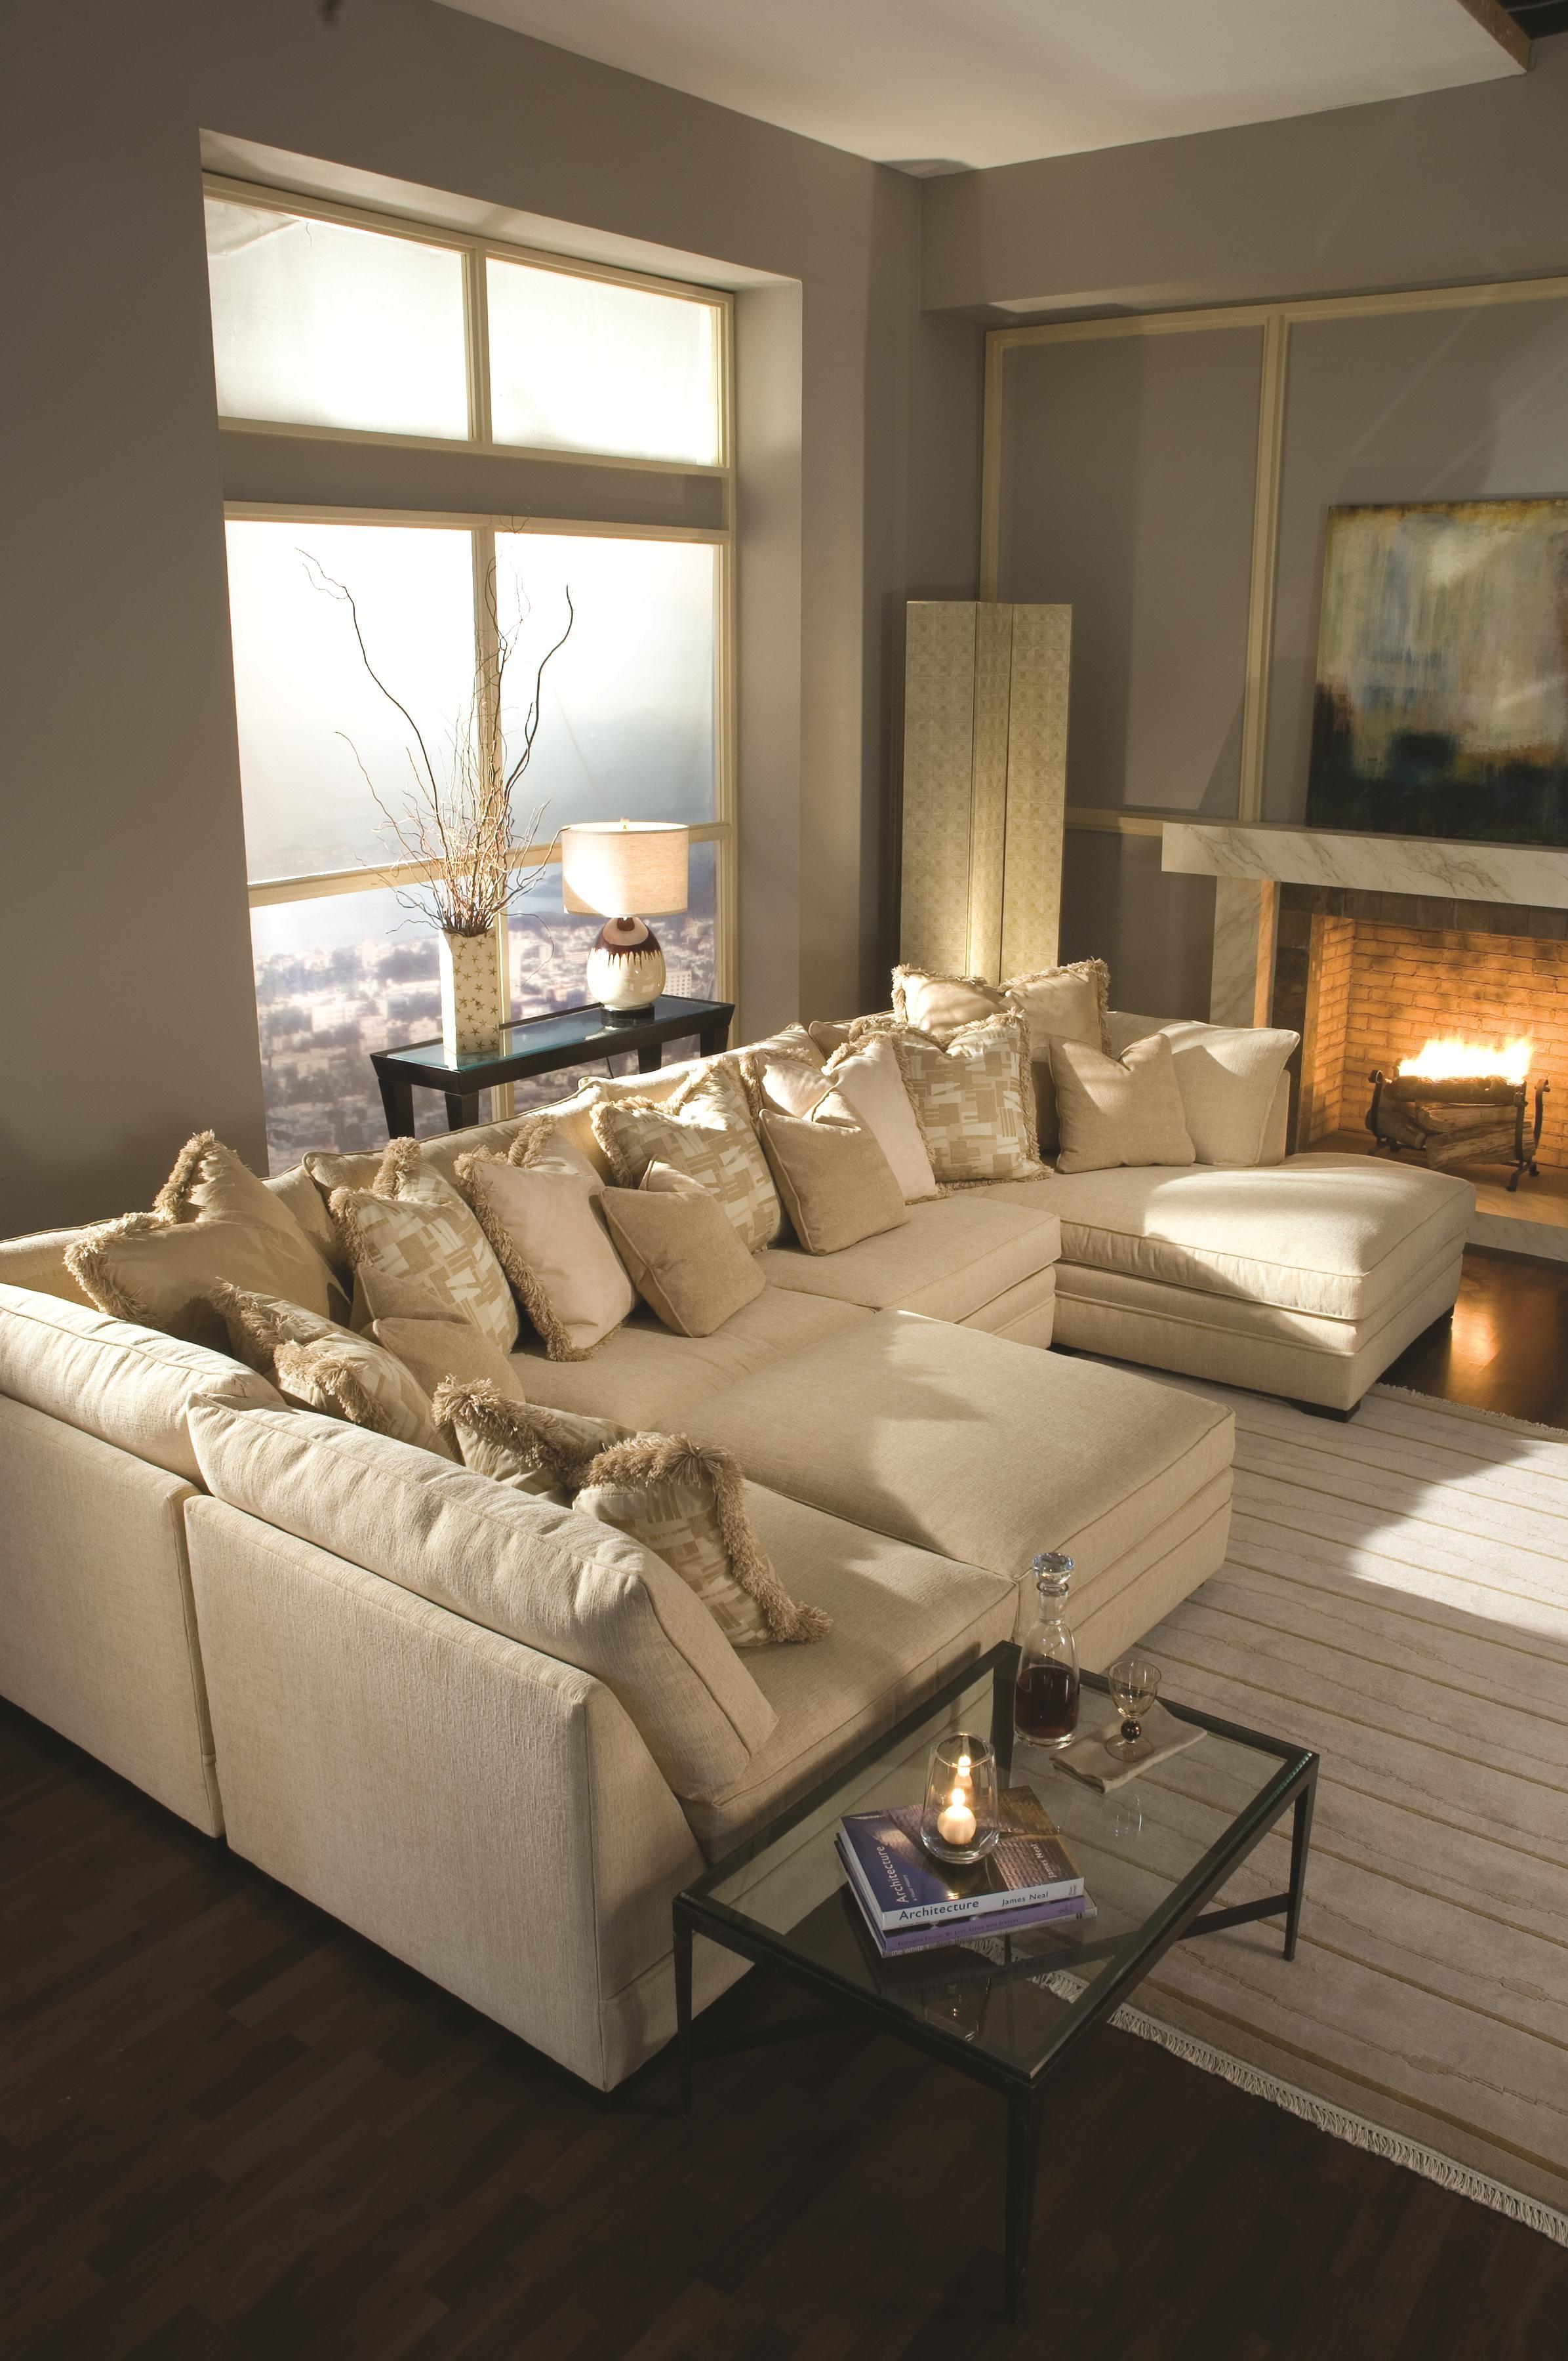 extra large sectional sofa visual hunt rh visualhunt com large sectional sofas big lots large sectional sofas canada